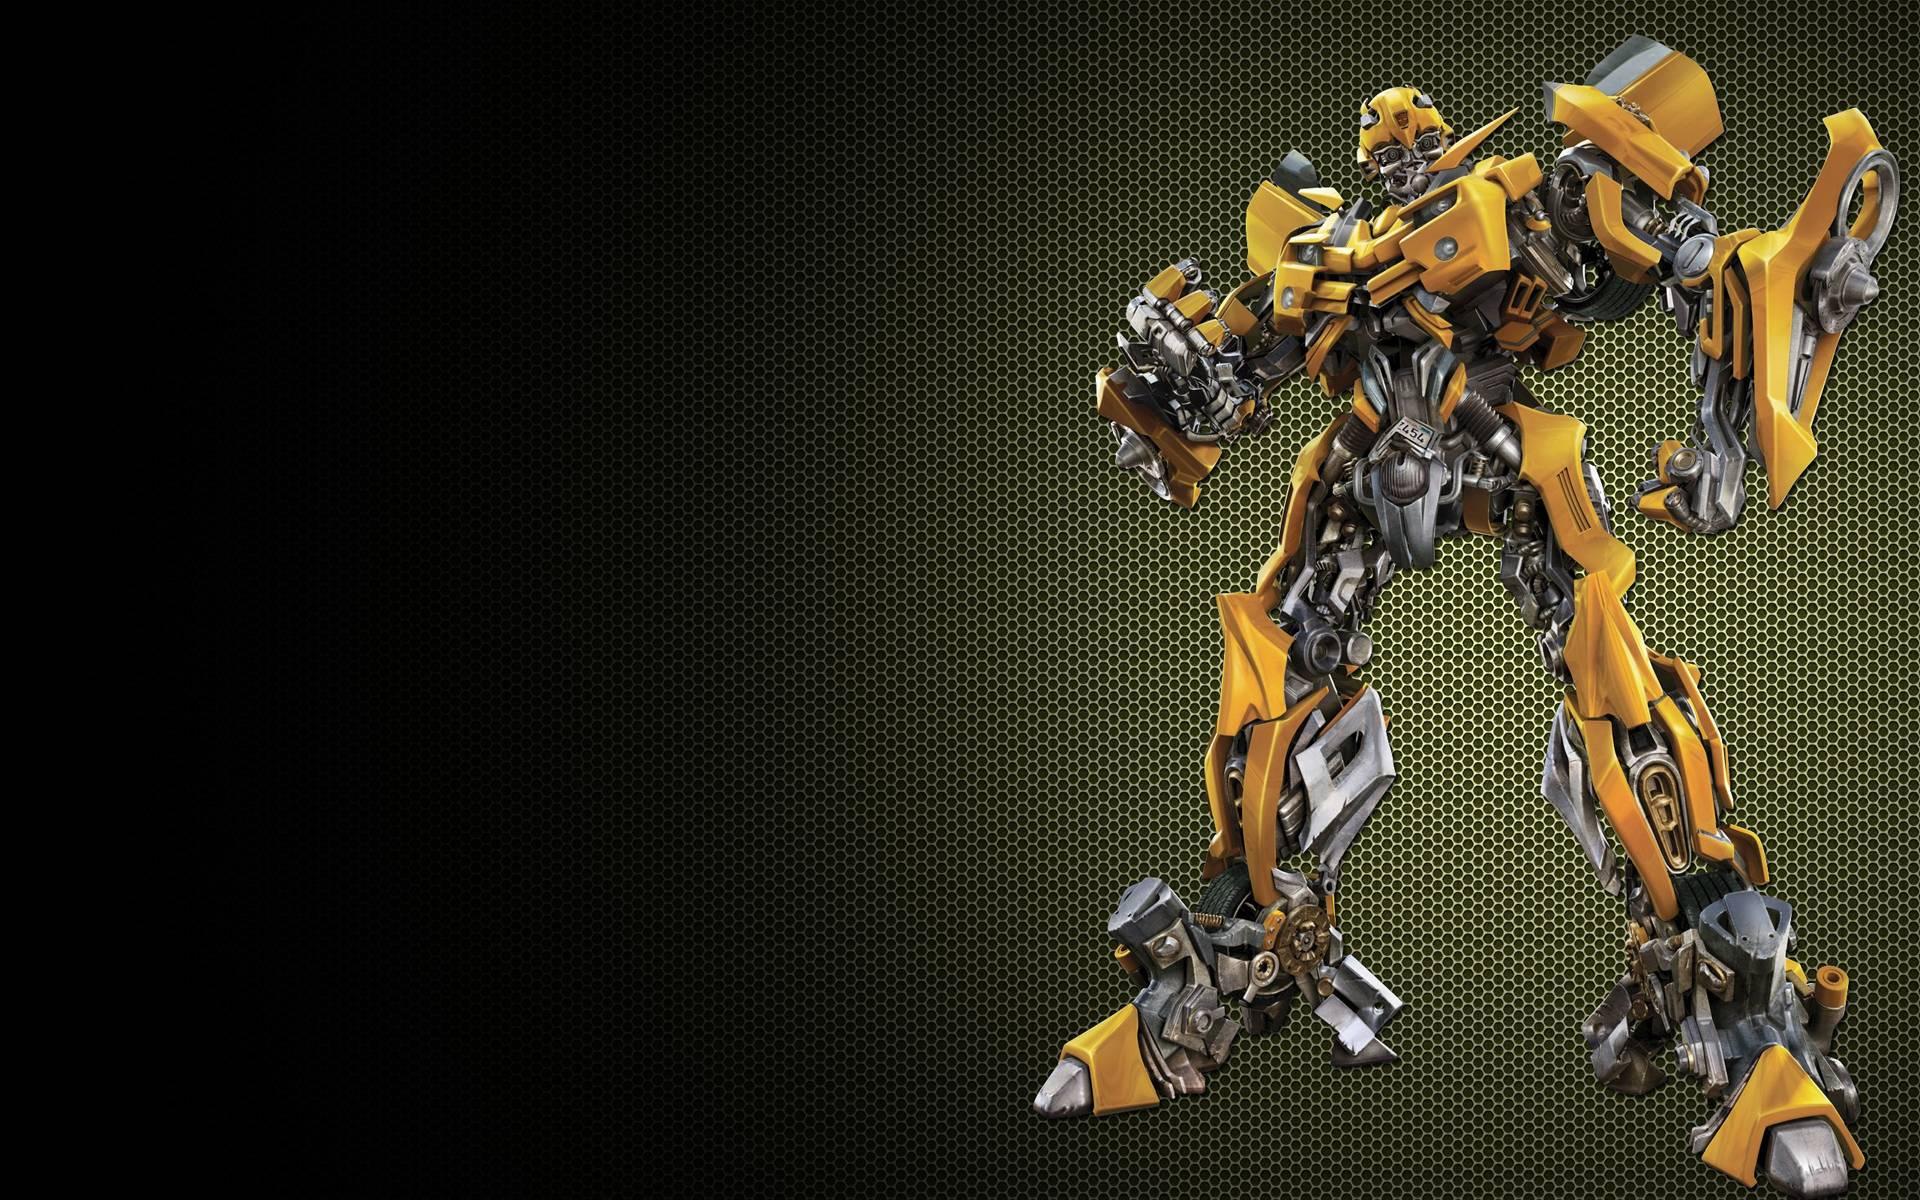 Bumblebee transformers wallpapers wallpaper cave - Transformers bumblebee car wallpaper ...